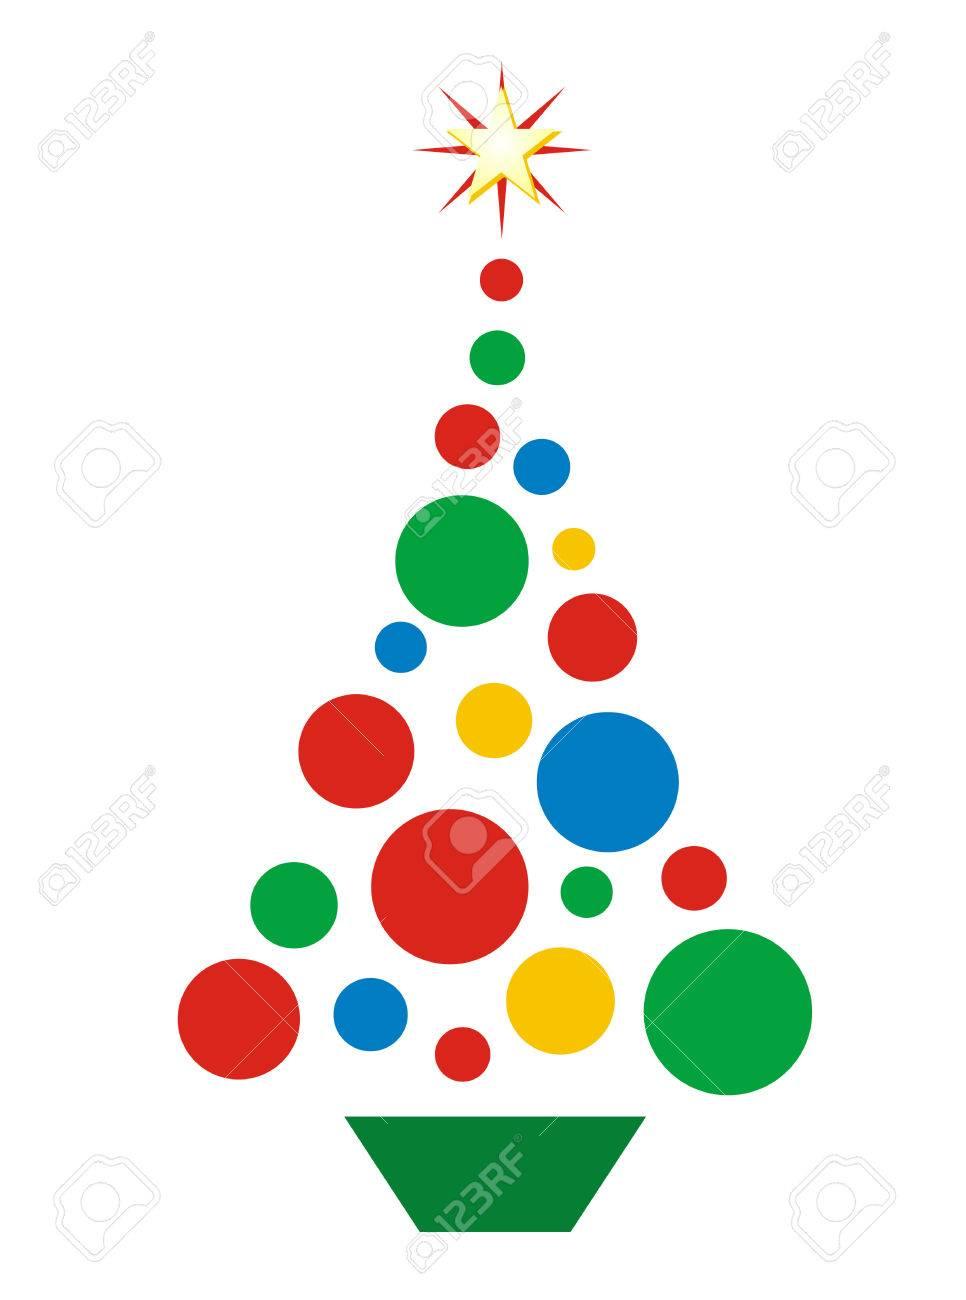 Vector Illustration Of Christmas Tree Shaped Of Circles. No ...